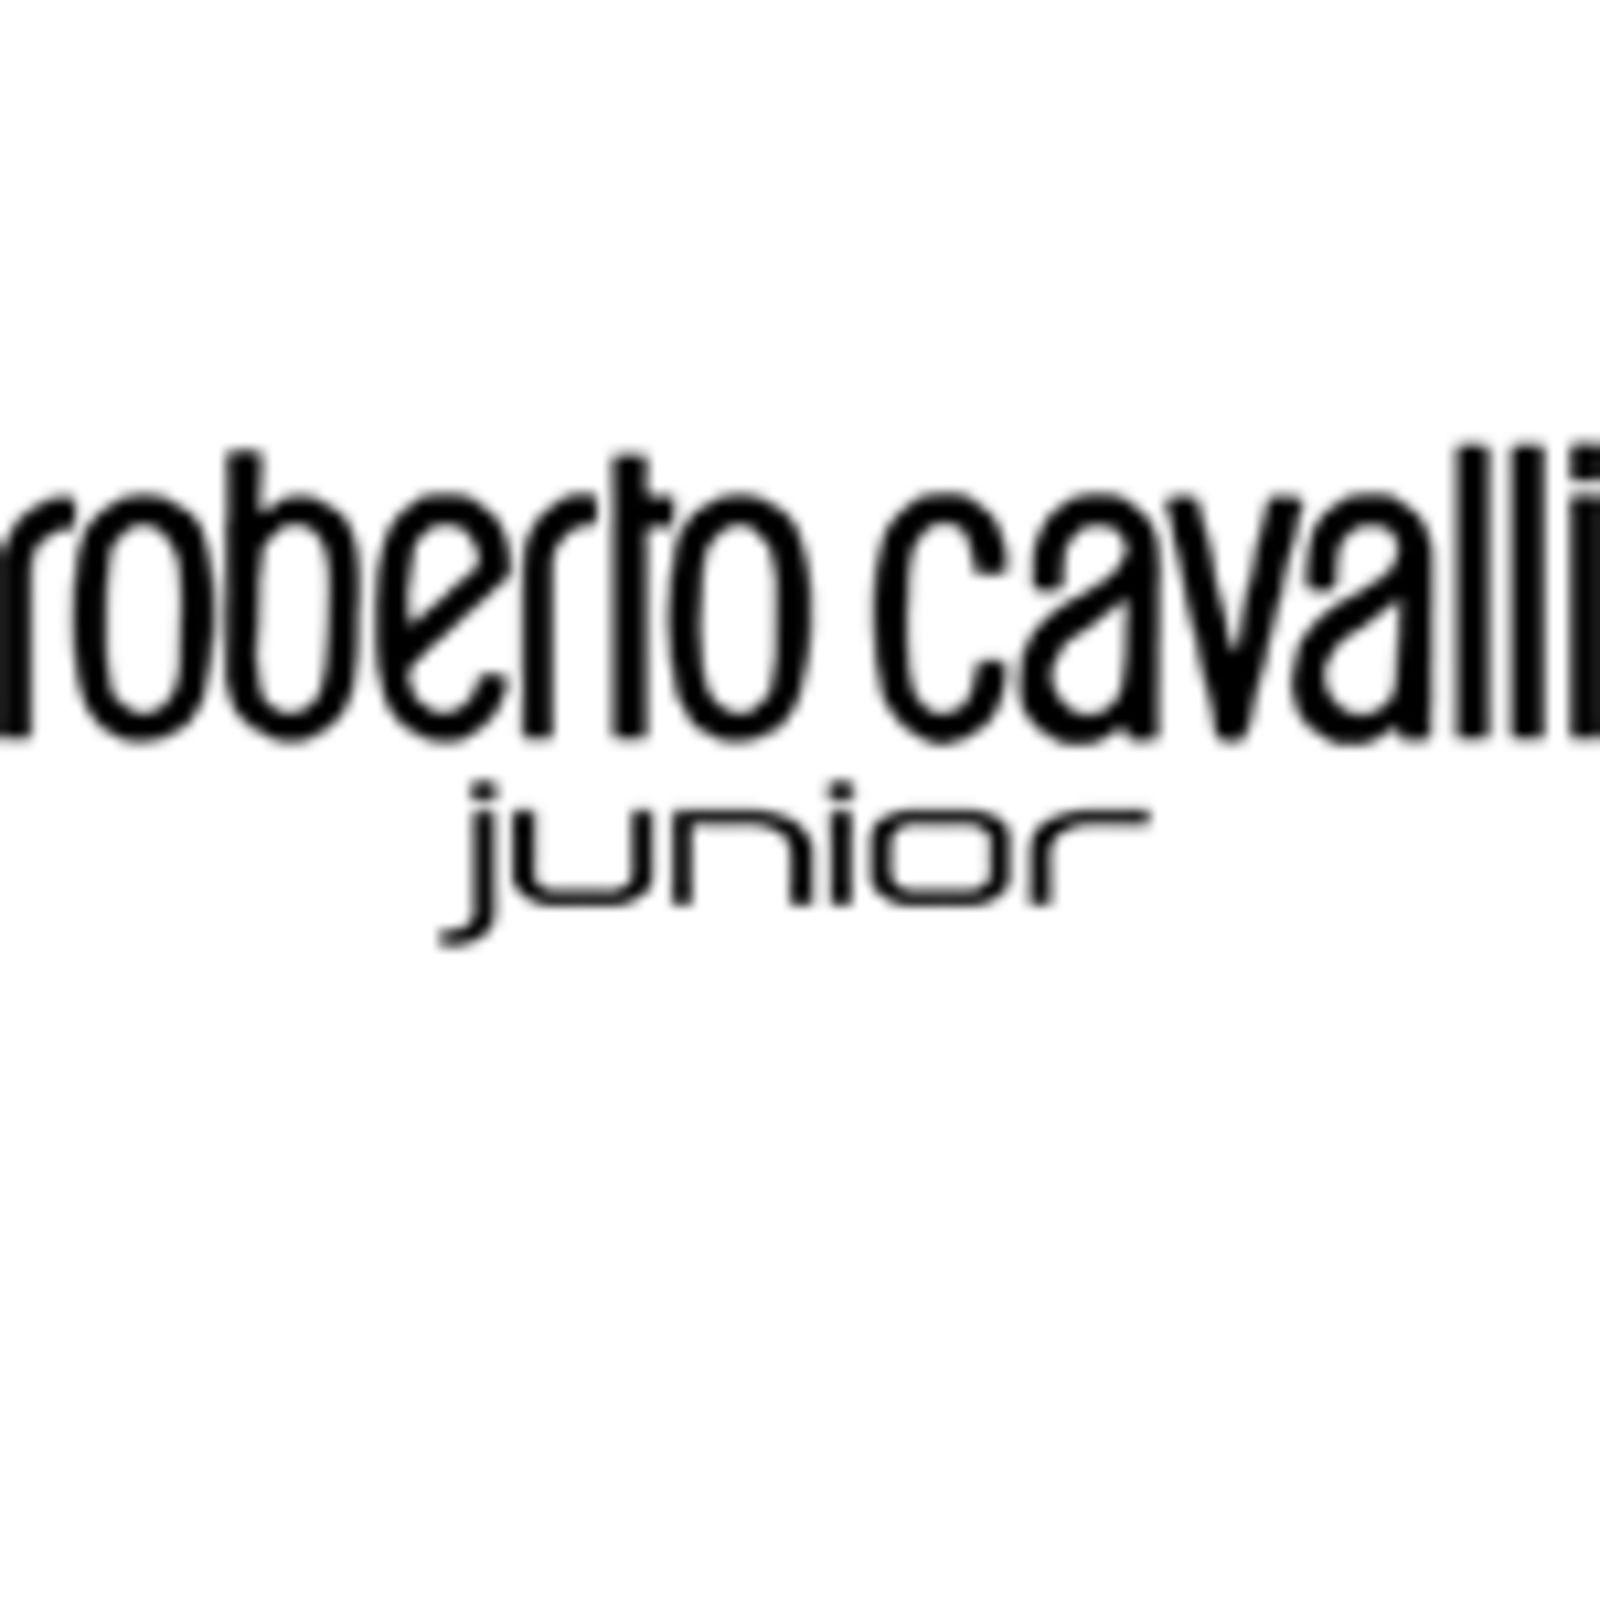 Roberto Cavalli Junior (Изображение 1)